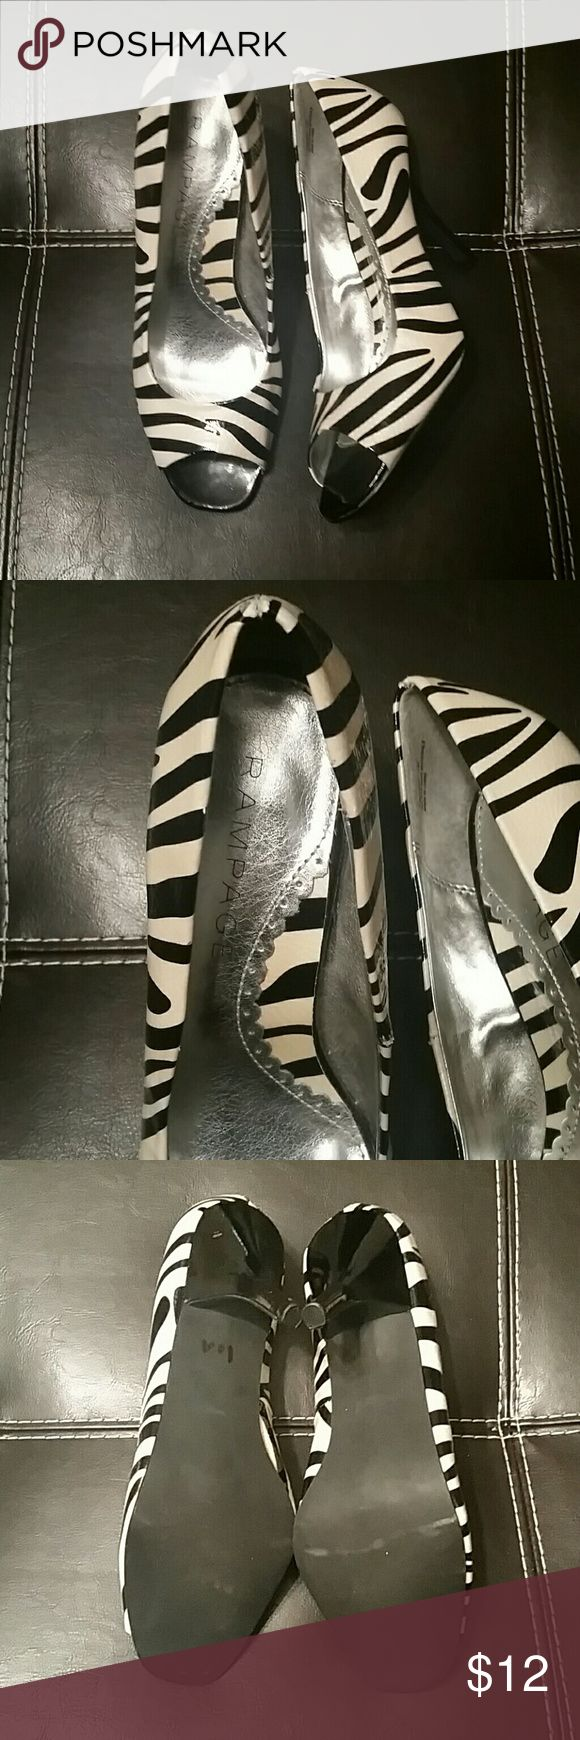 Zebra Print Pumps Rampage zebra print peep toe pump. Rampage Shoes Heels